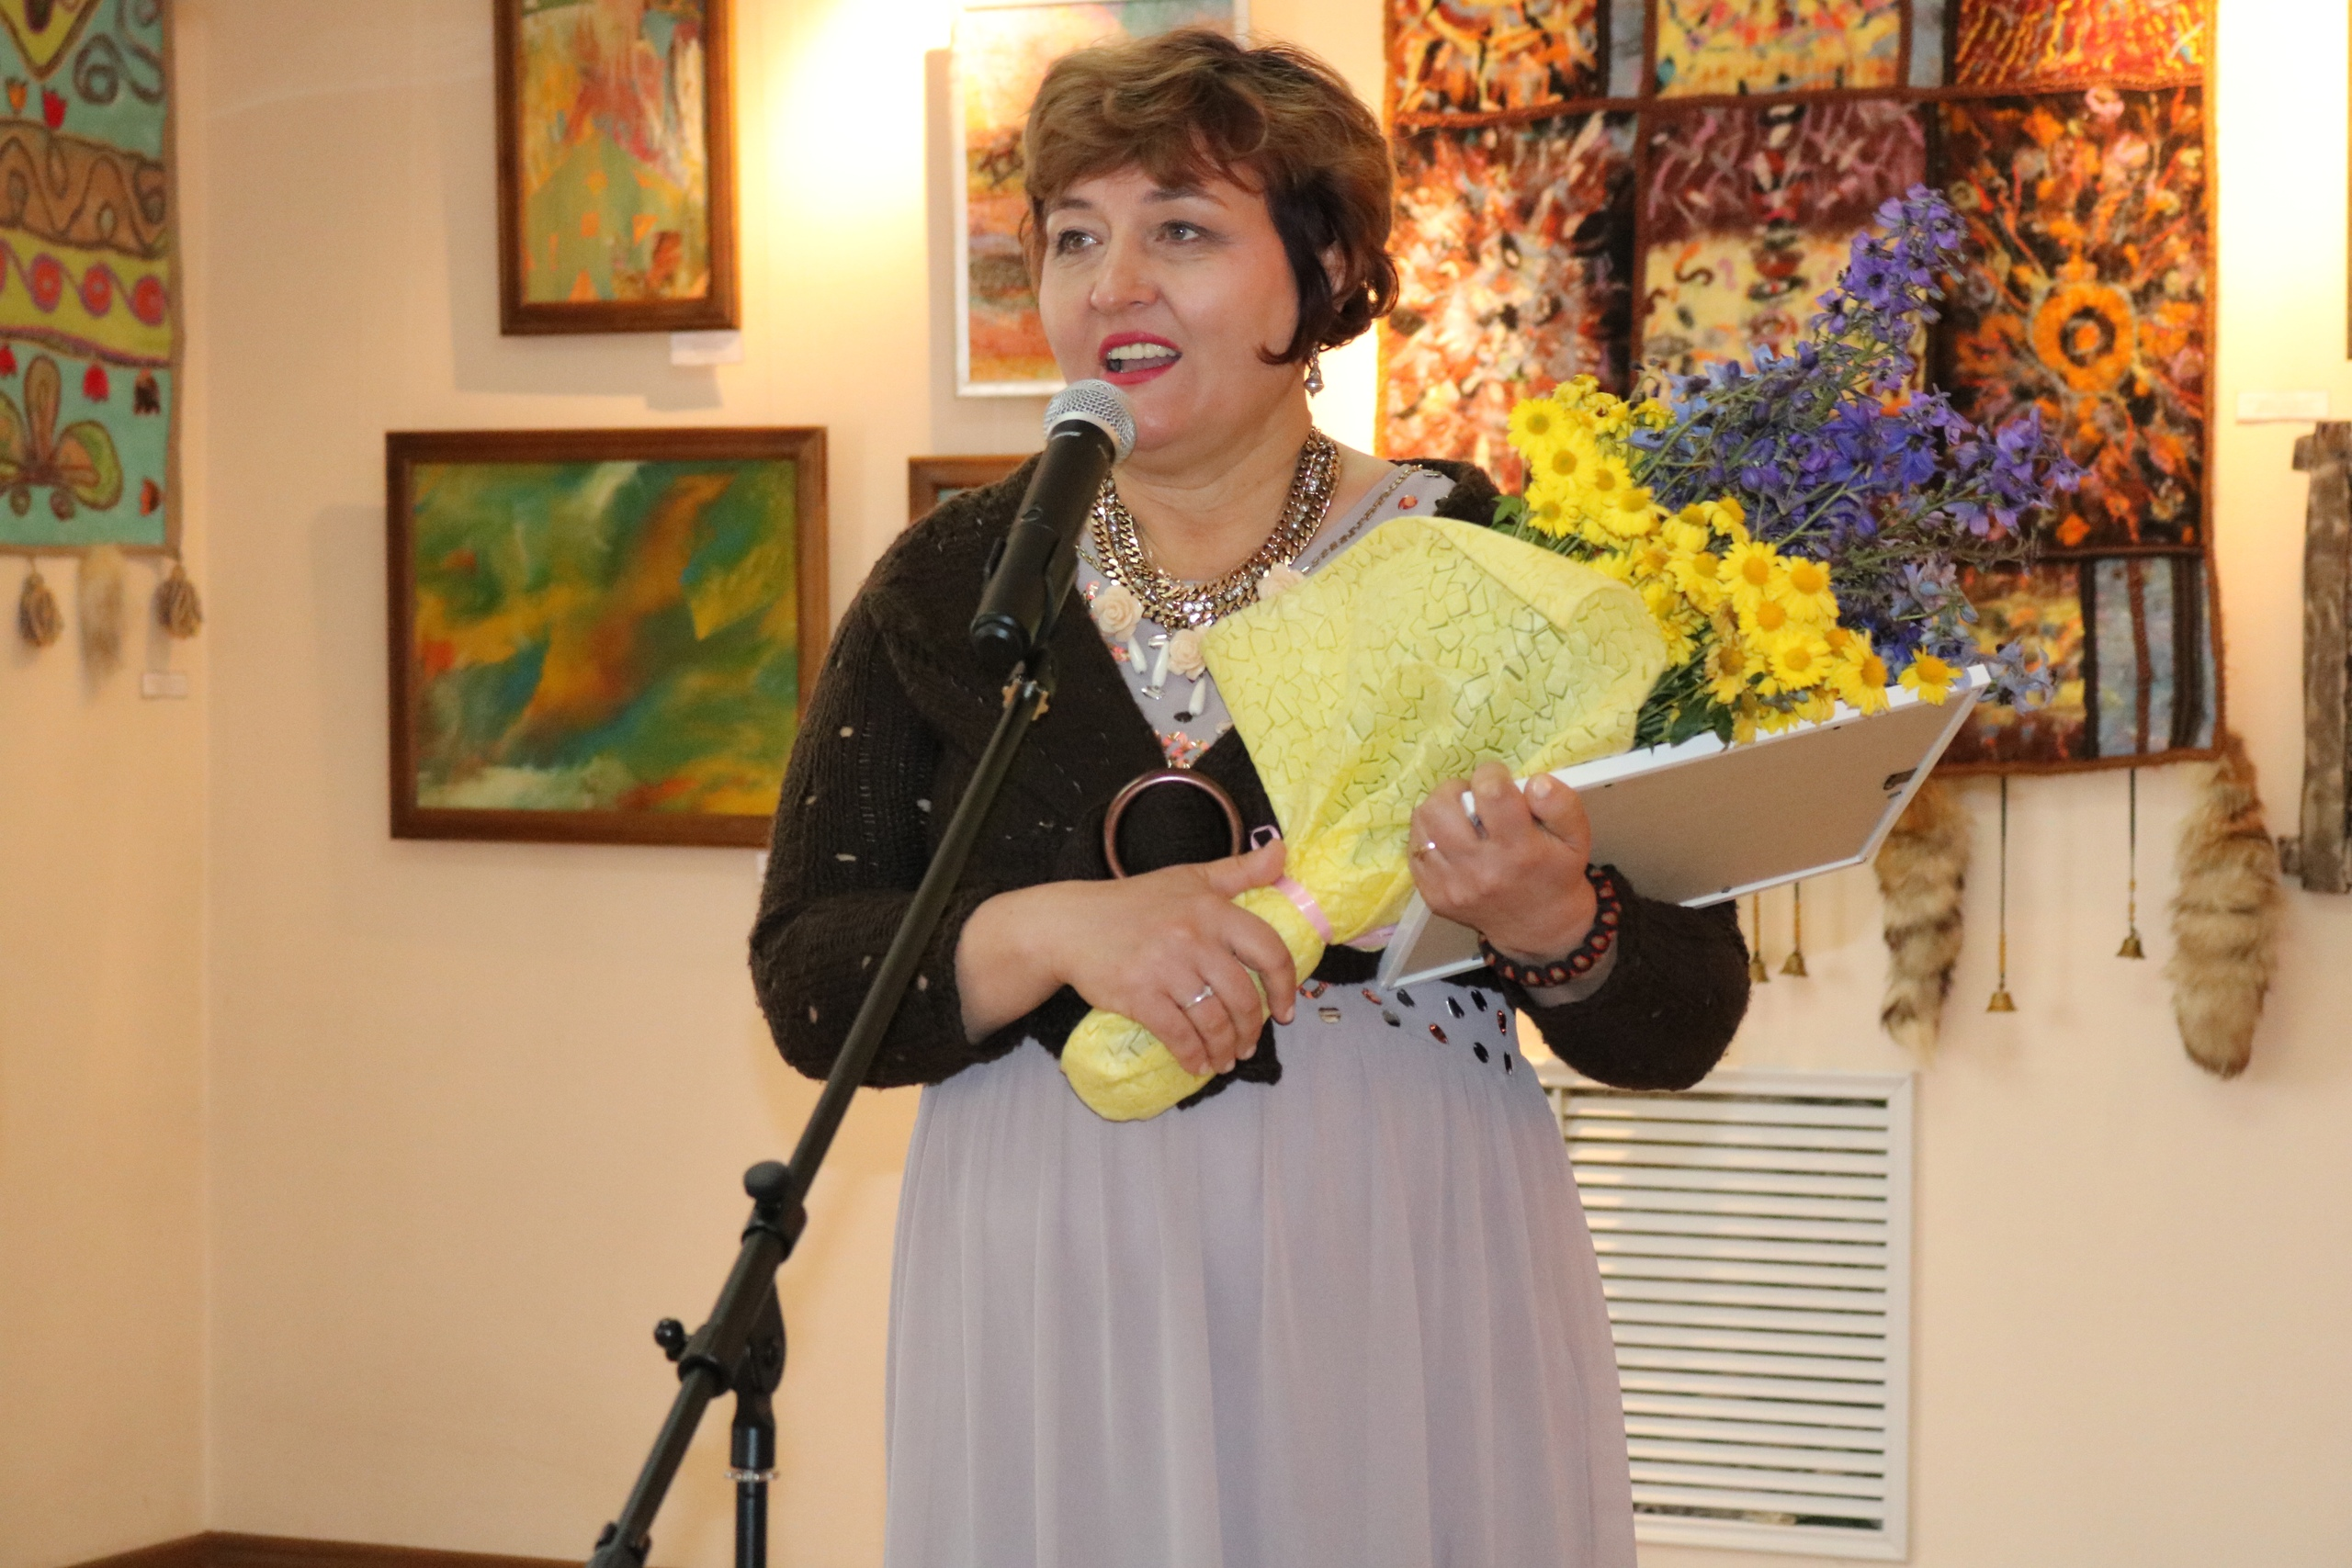 Открылась персональная выставка Светланы Каратаевой